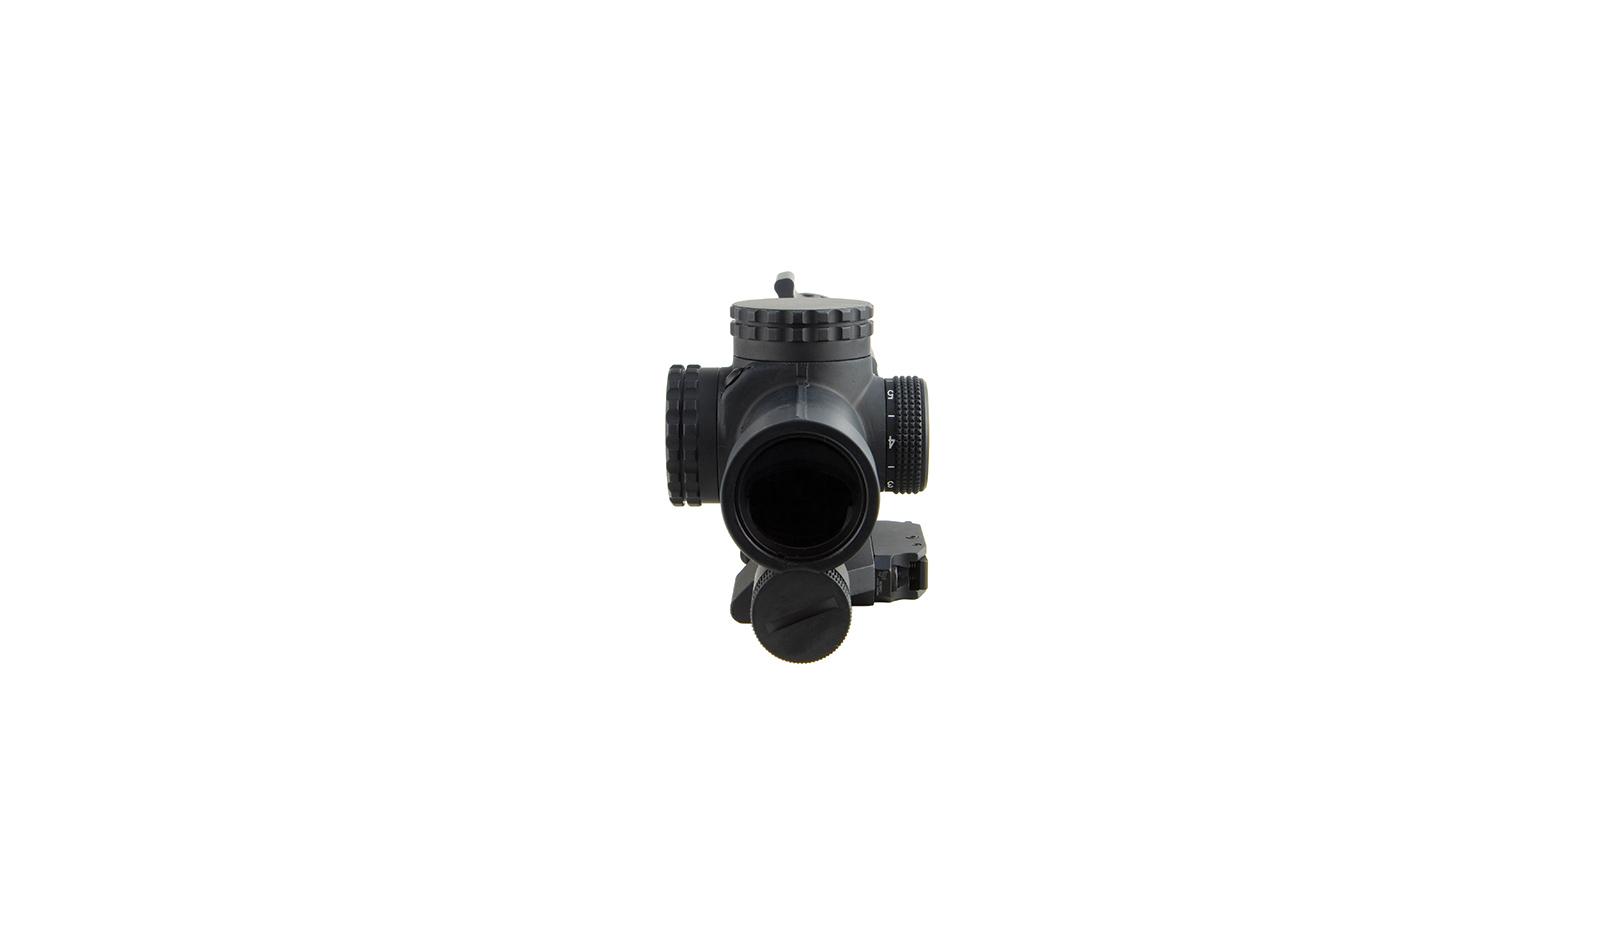 VC16-C-1600050 angle 8